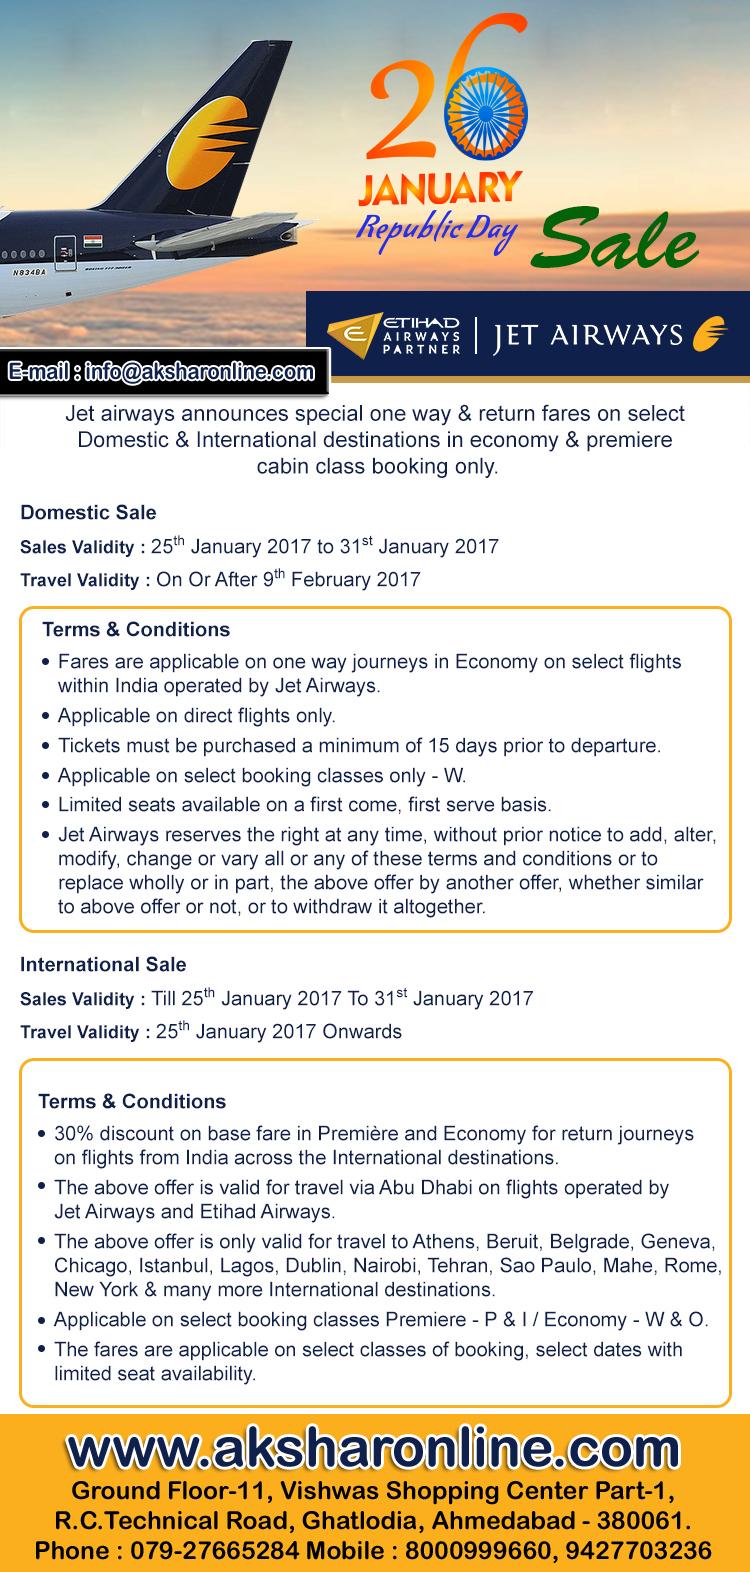 www.aksharonline.com, akshar infocom, jetairways sale, domestic sale, air ticket booking, tour agent, air ticket agent in ghatlodia